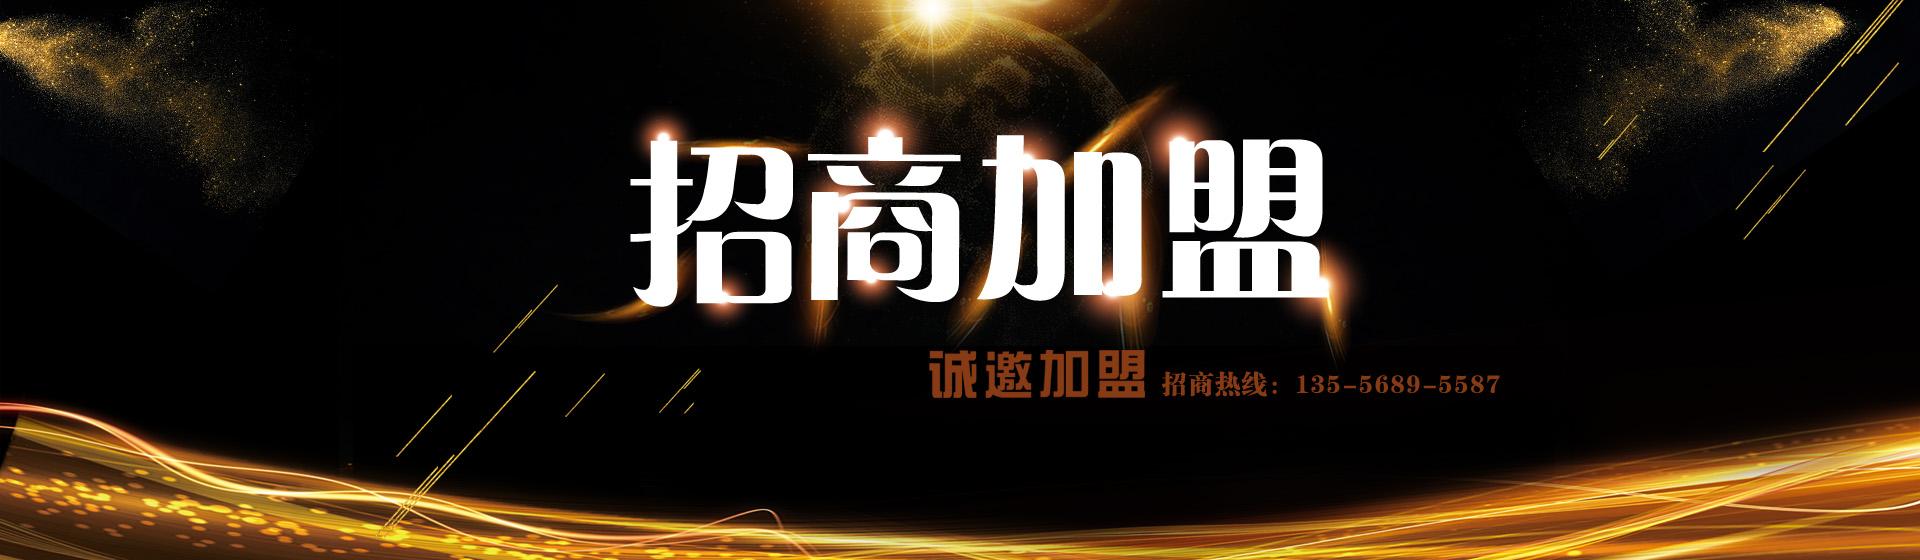 http://www.5365193.live/p-dailijiameng.html